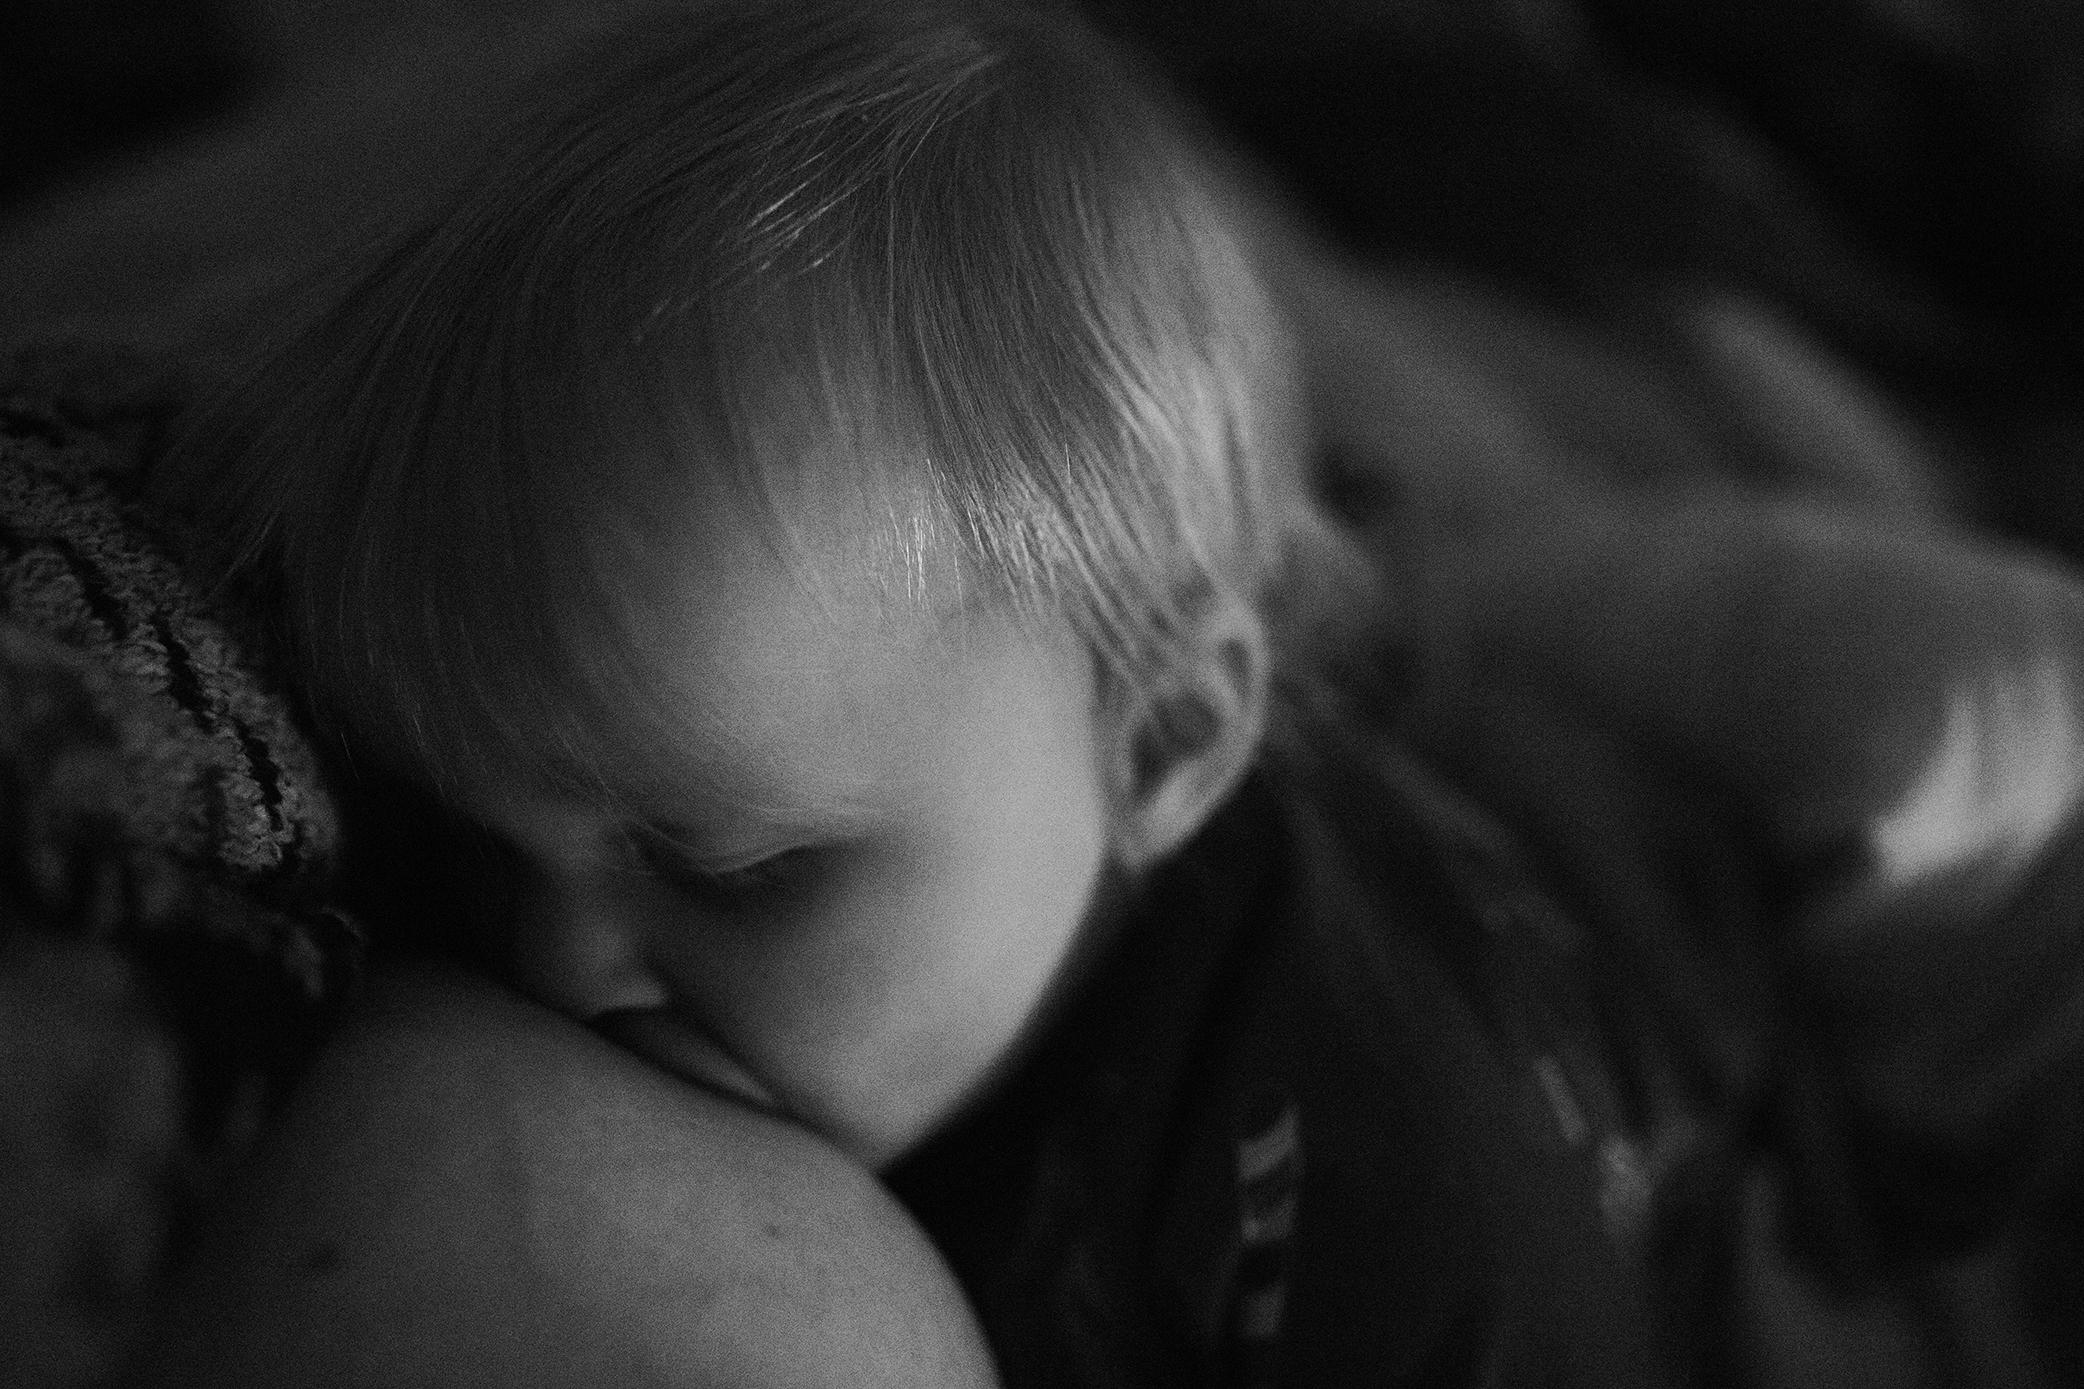 39. 365 - Good night, my sweet baby.